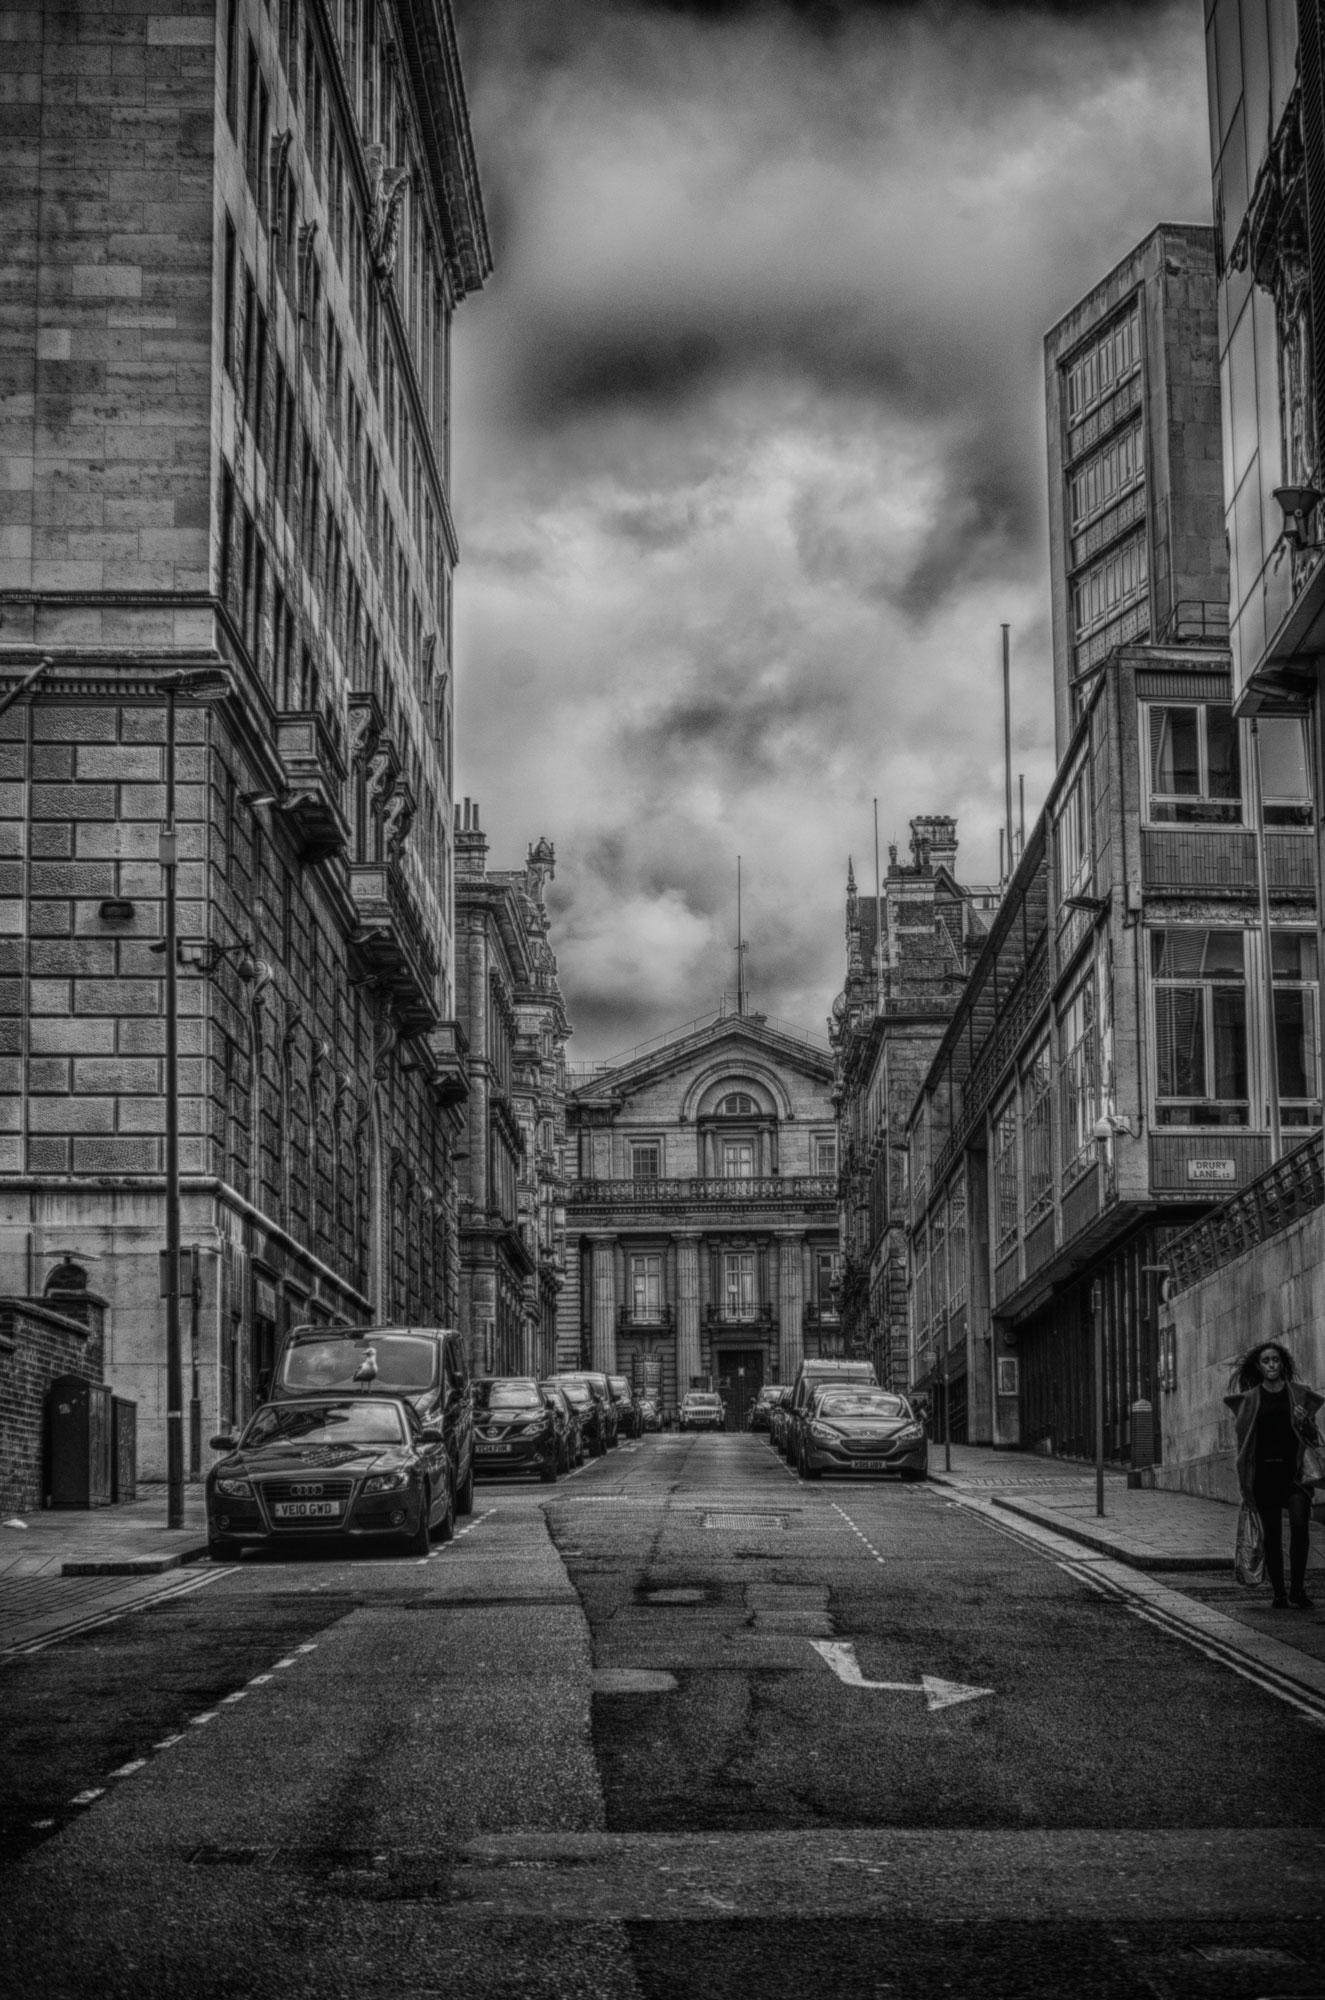 Road to Docks by Joanna Gawkowska